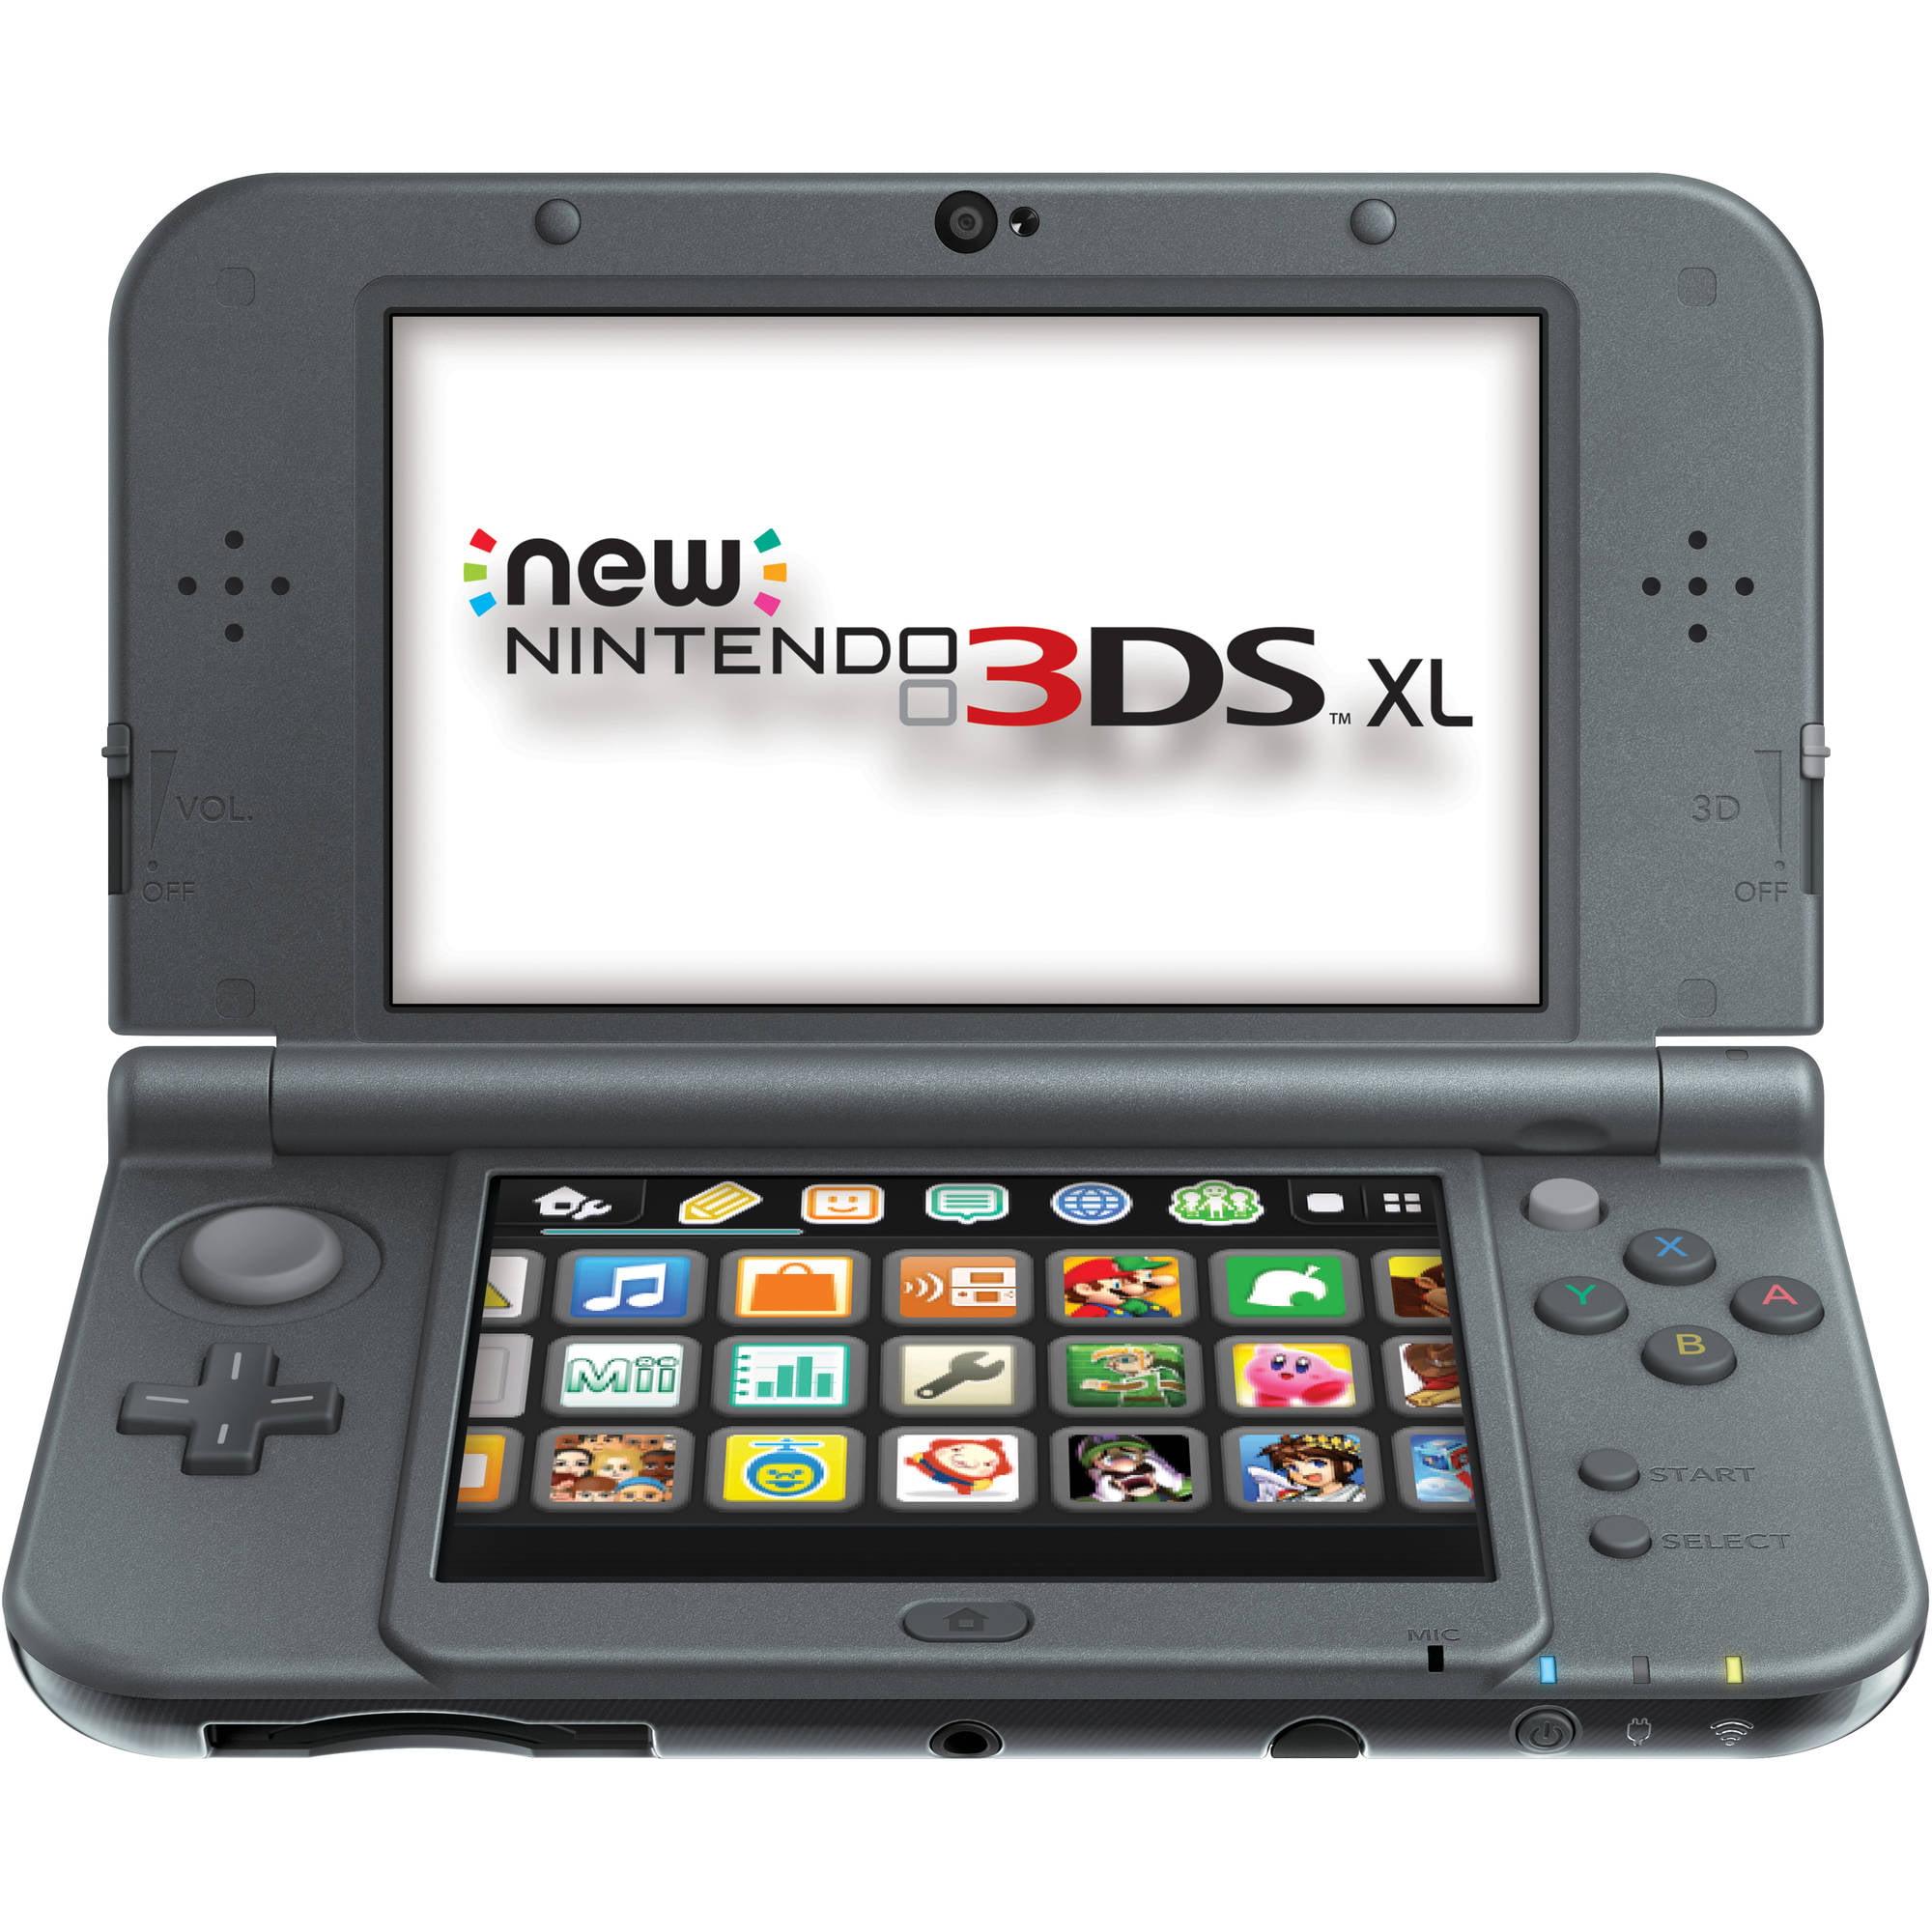 Refurbished New Nintendo 3DS XL Handheld Gaming System, Black